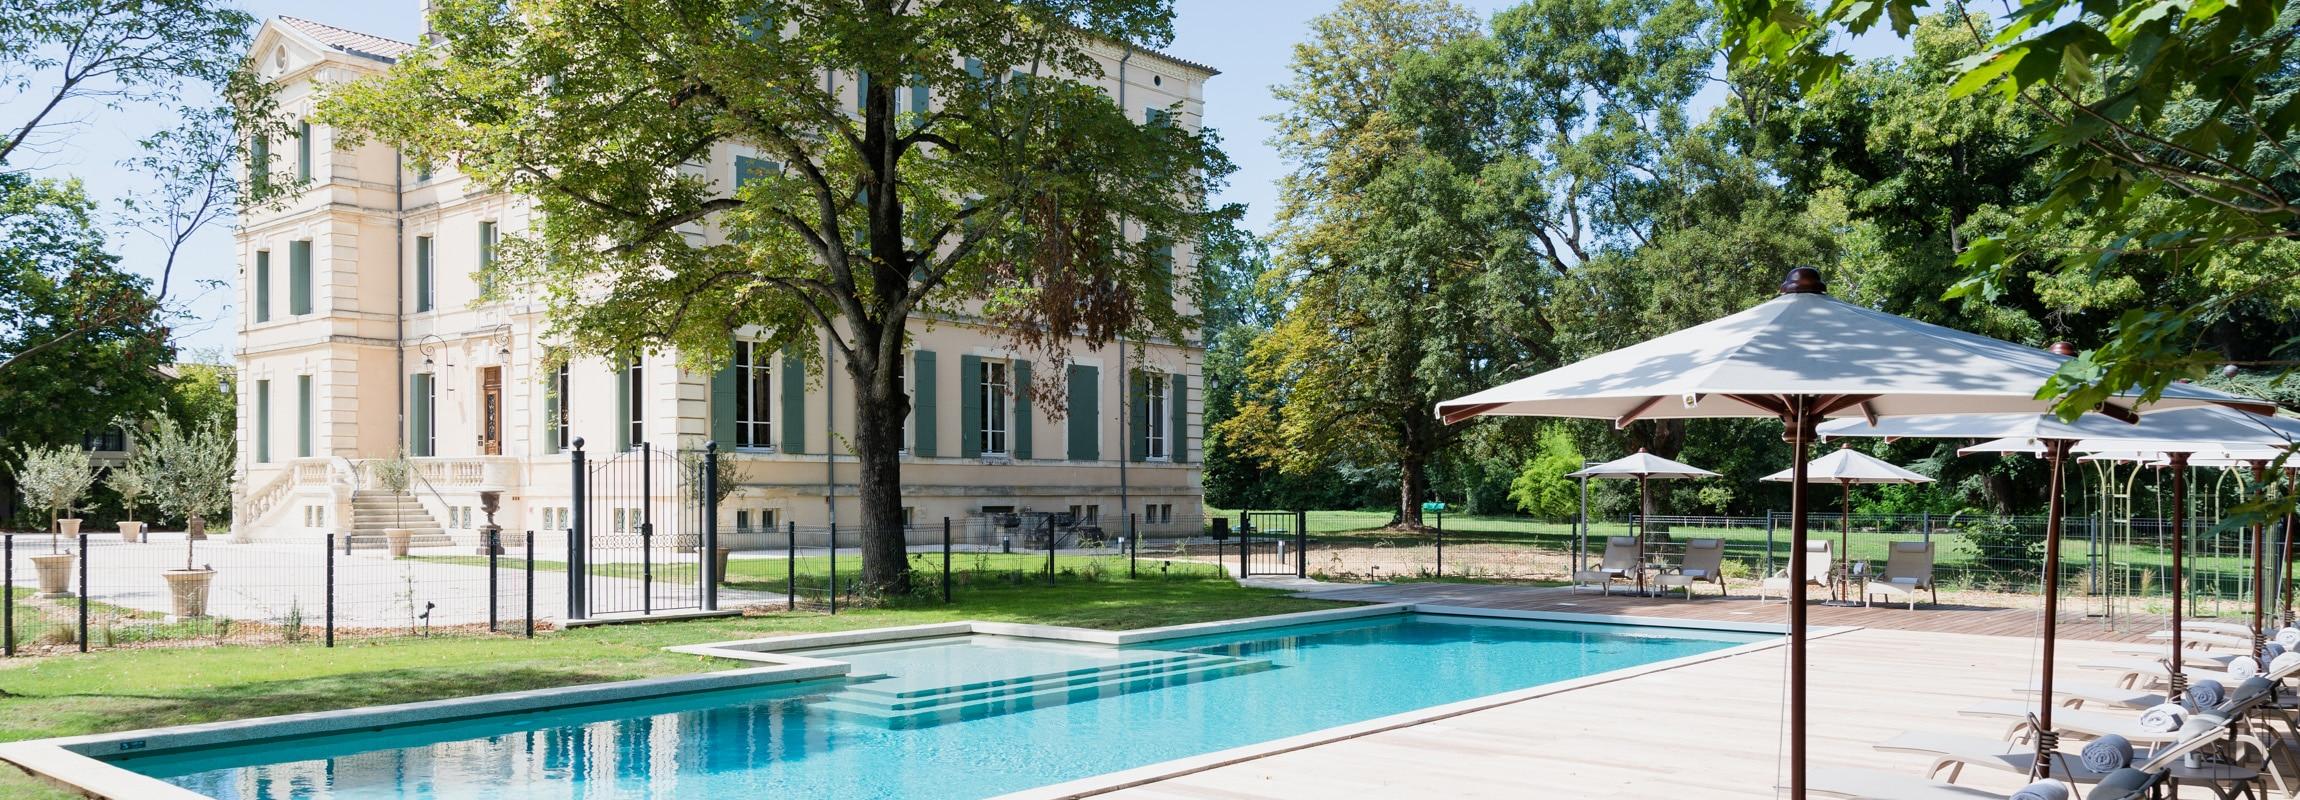 piscine natation provence france ch teau de montcaud. Black Bedroom Furniture Sets. Home Design Ideas